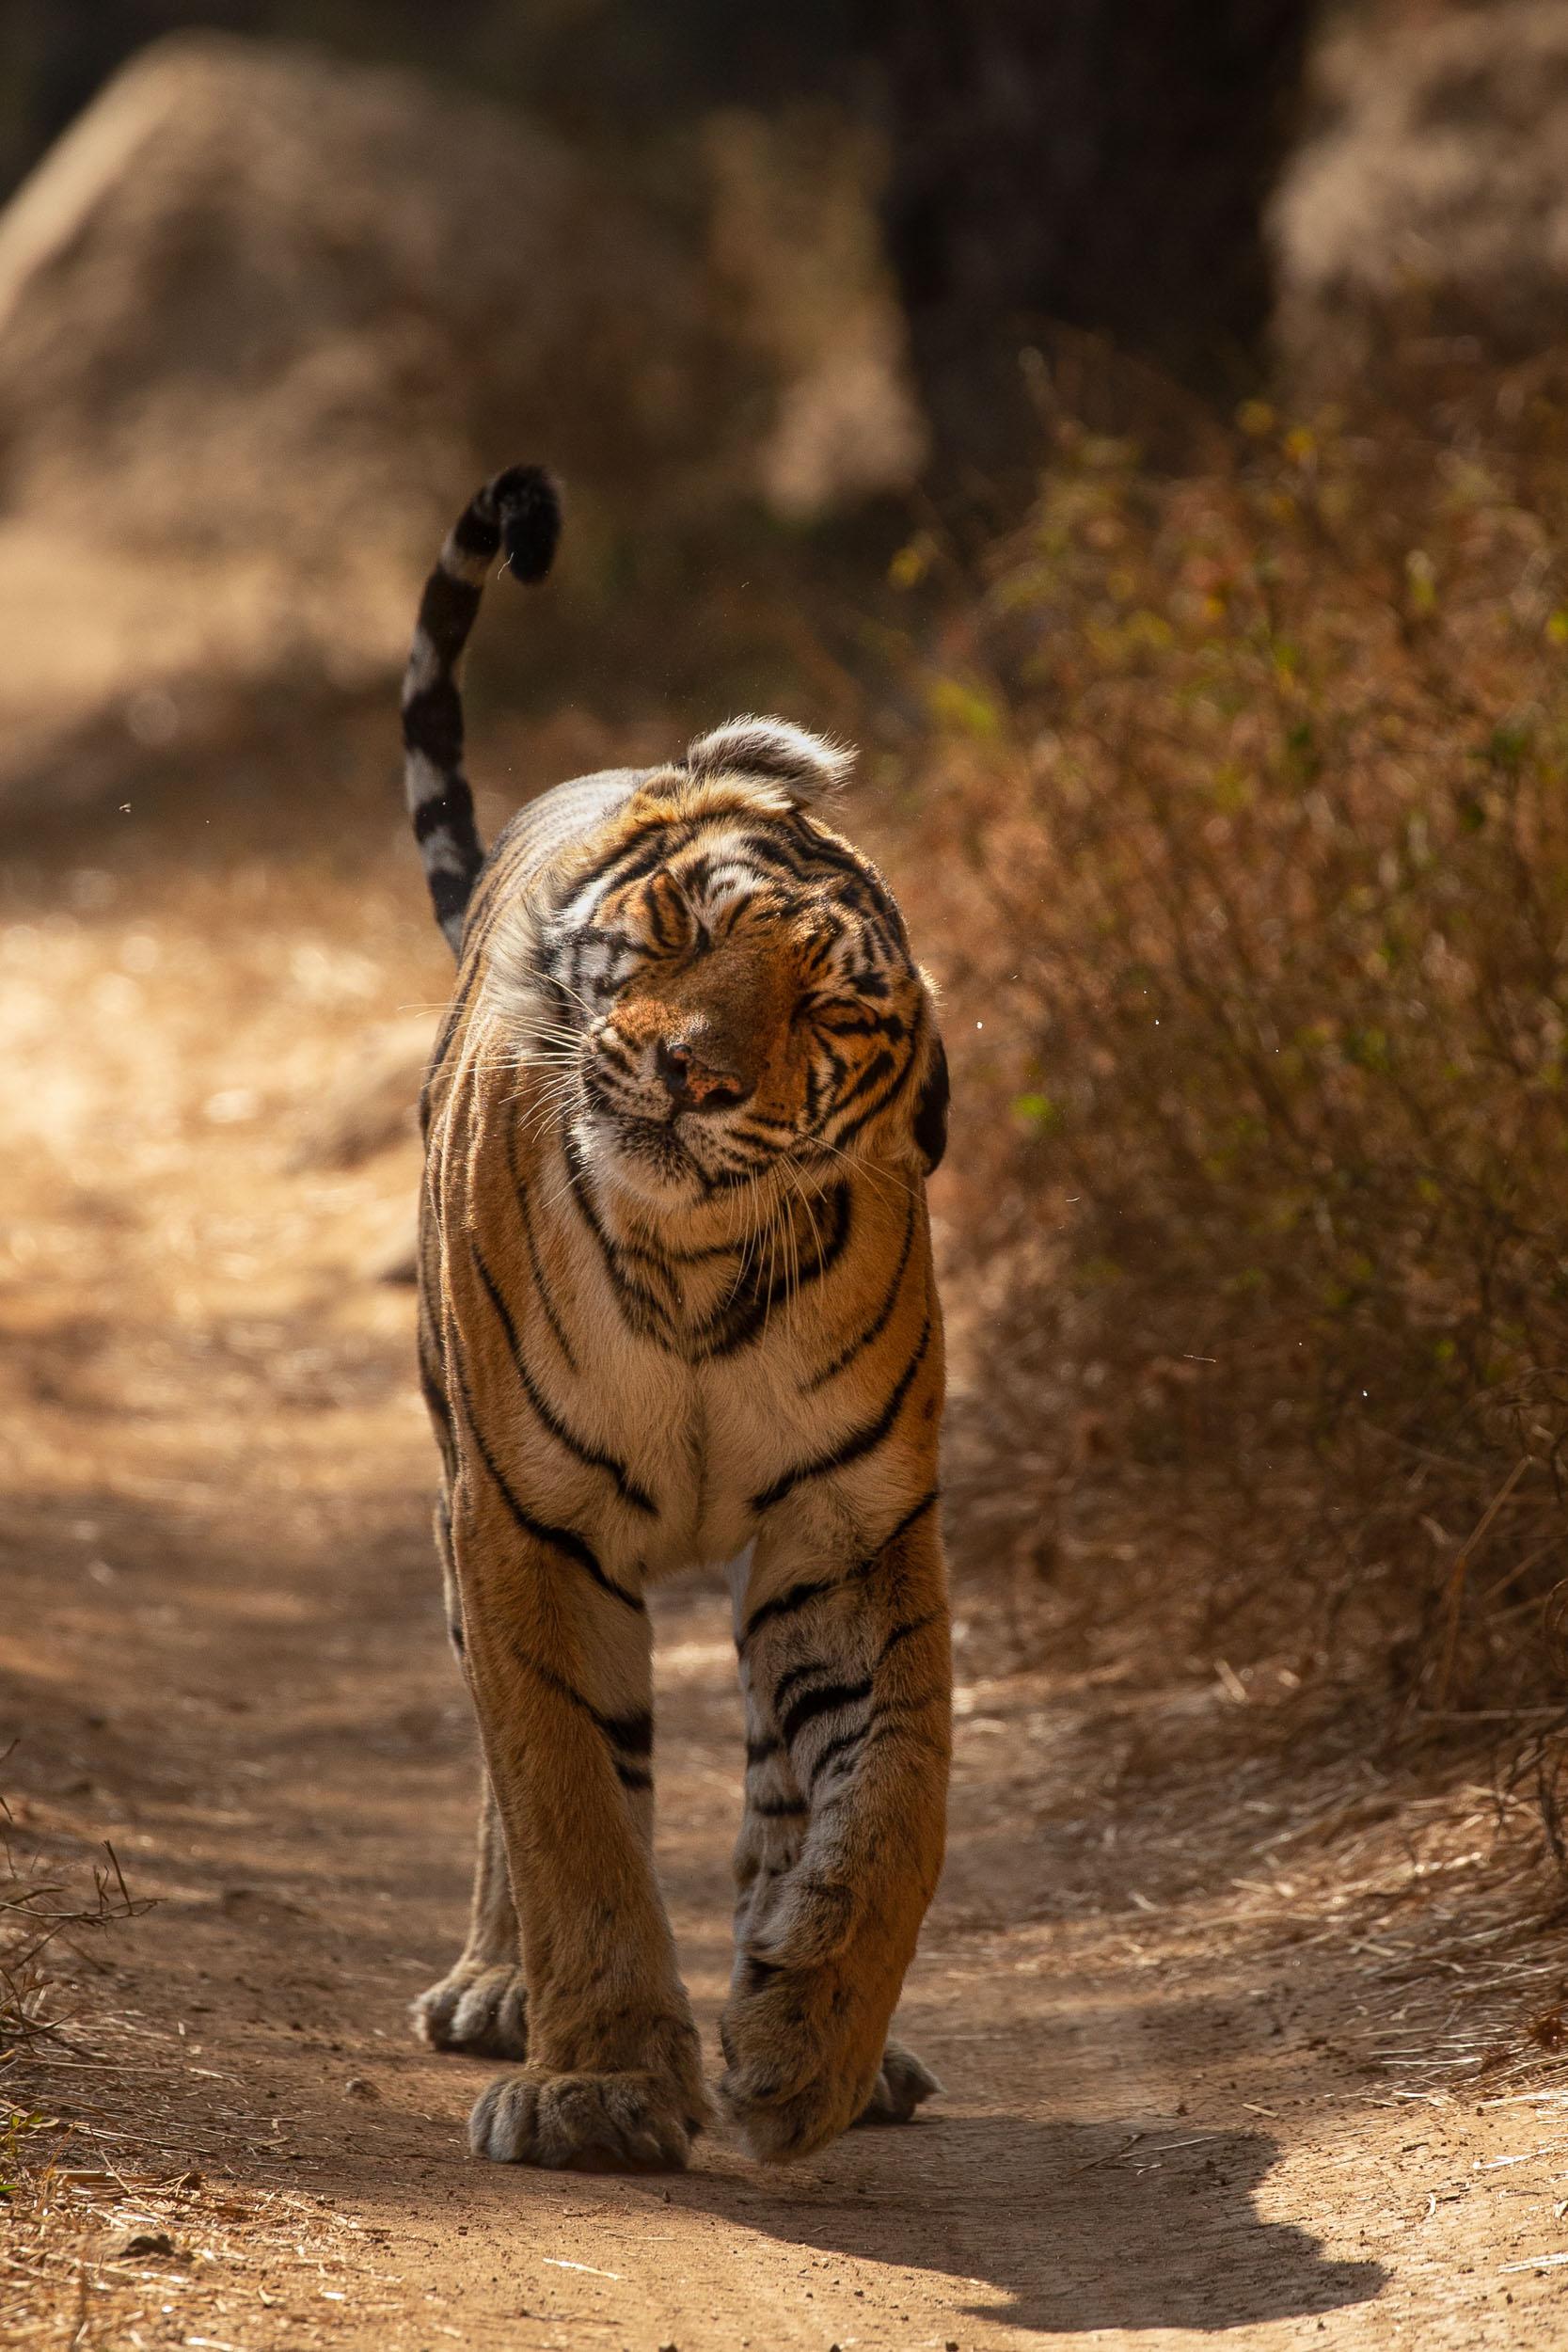 yorkshire_wildlife_photographer-6.jpg